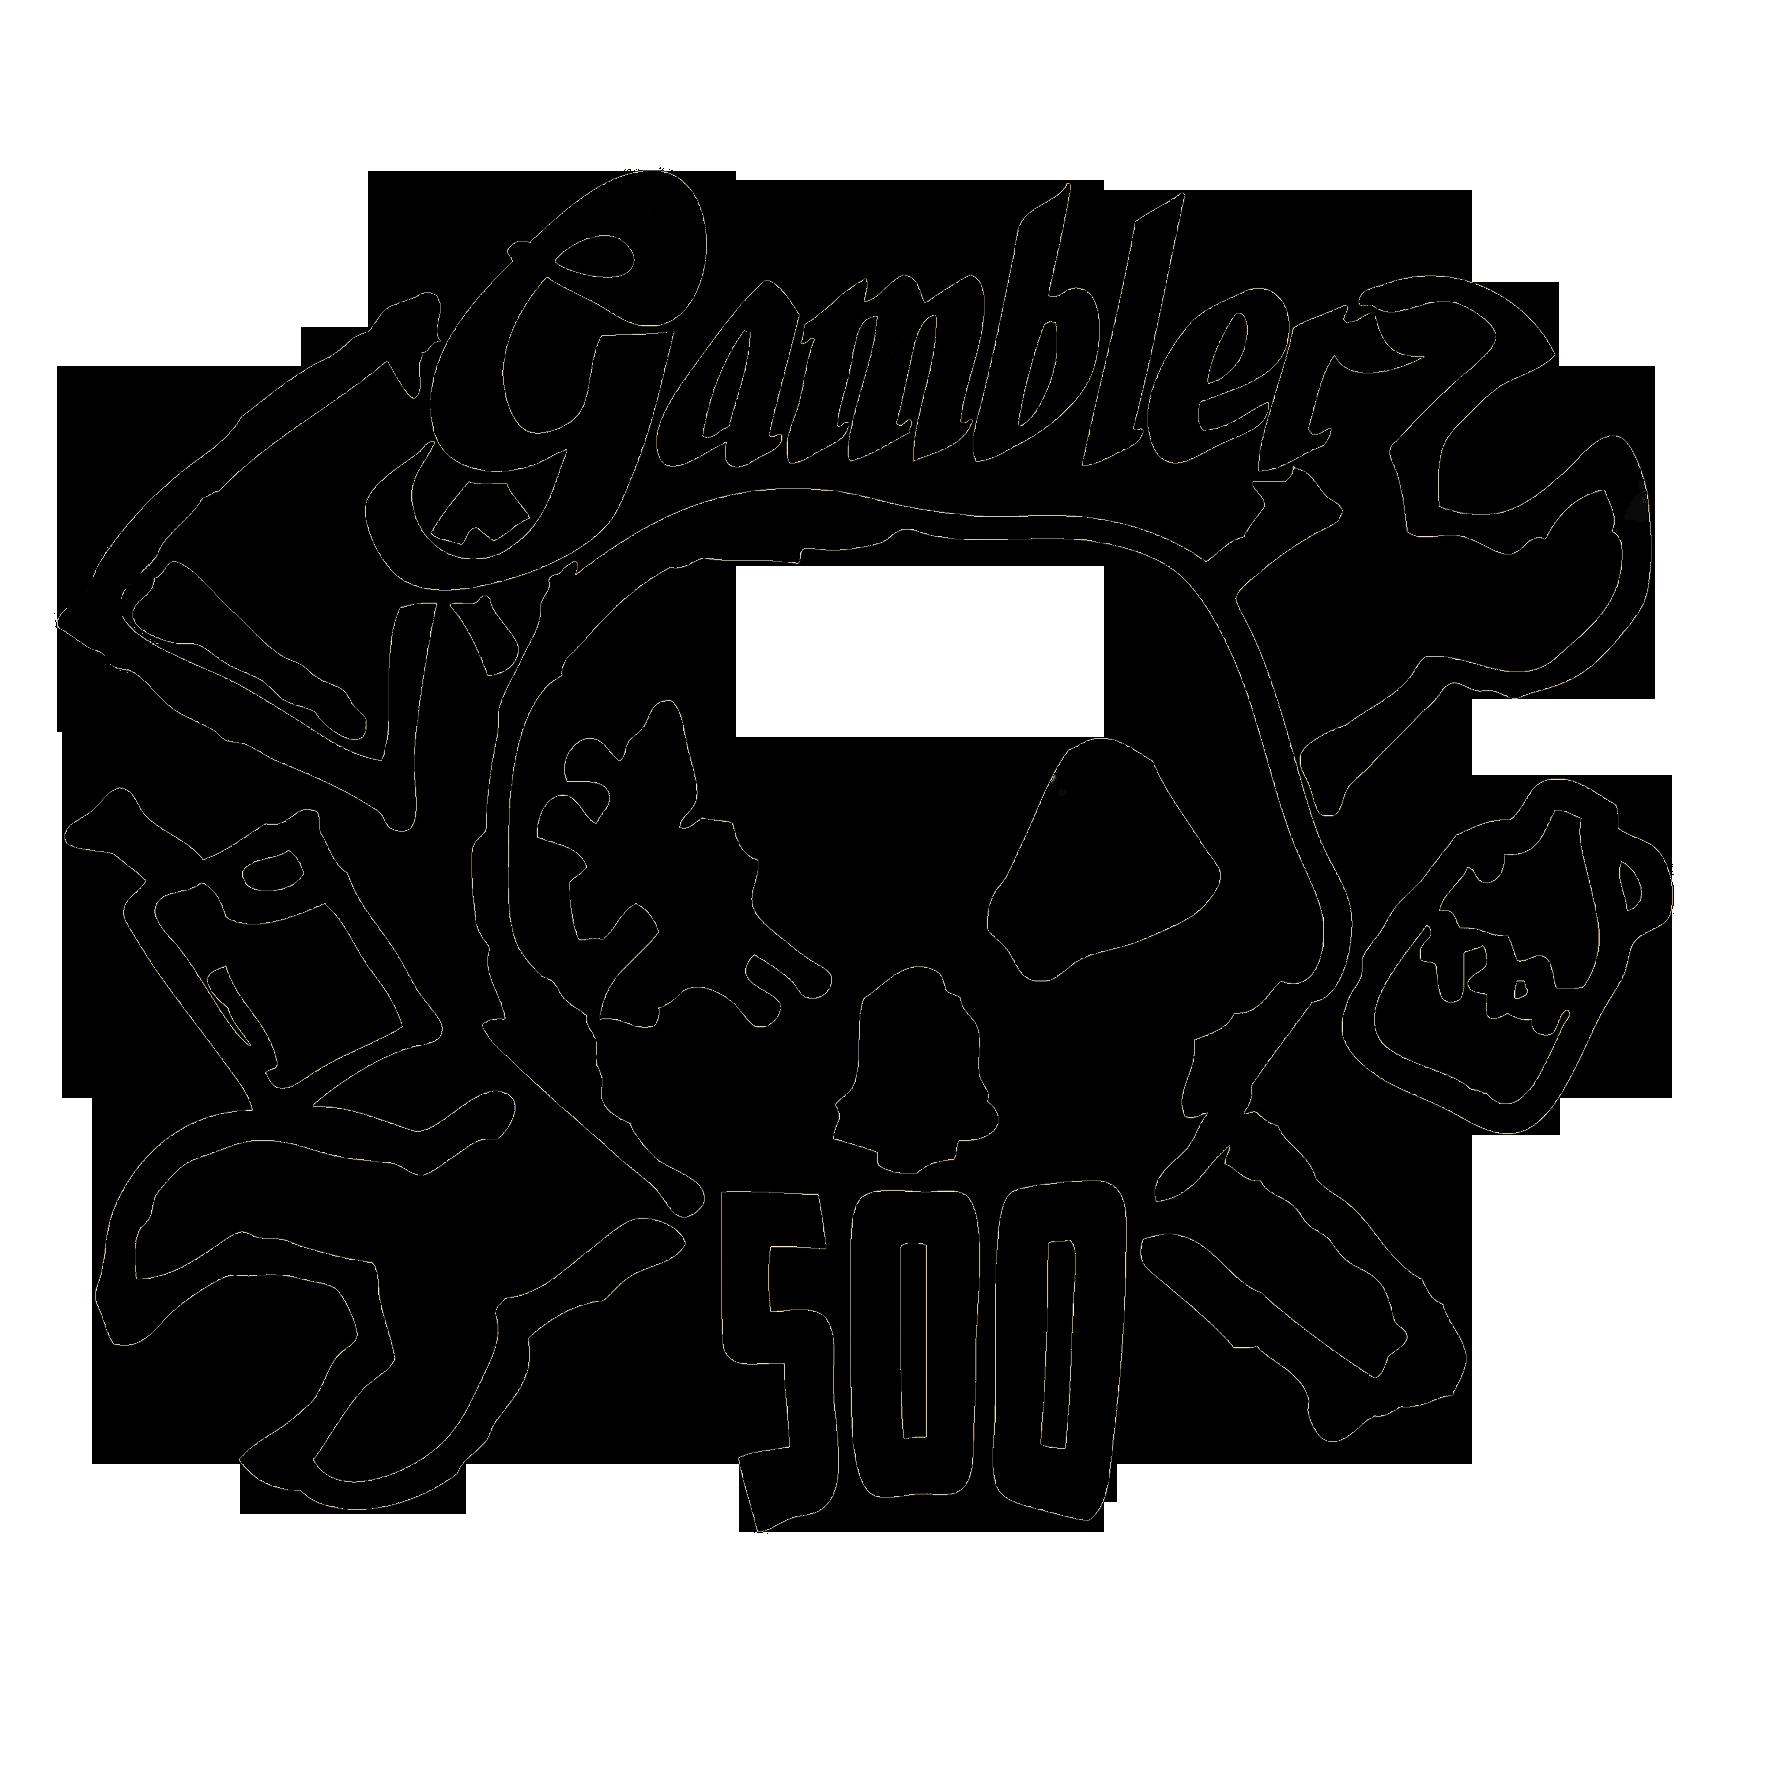 www.gambler500.com